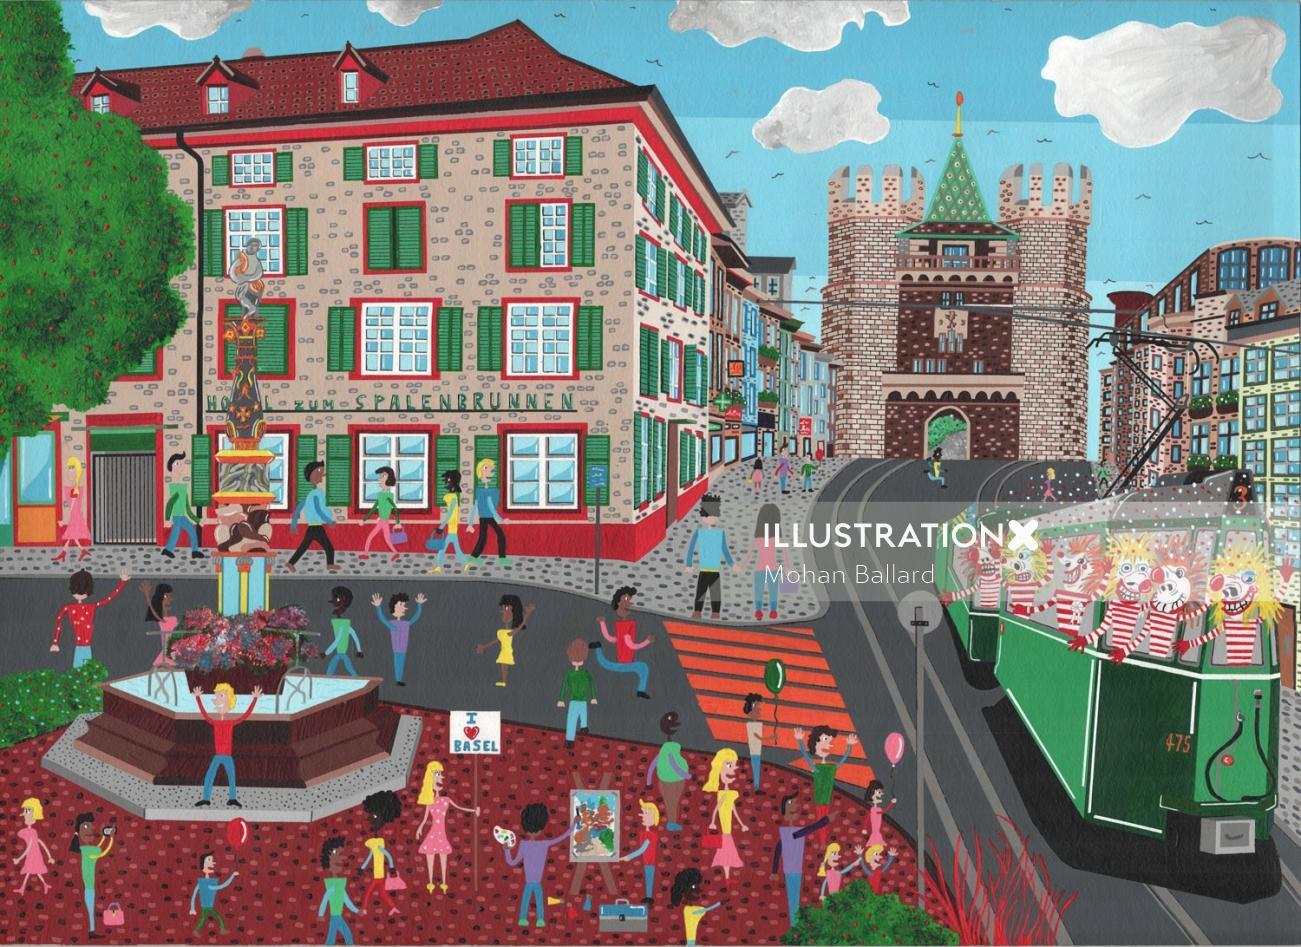 An Illustration Of Spalentor City Scene